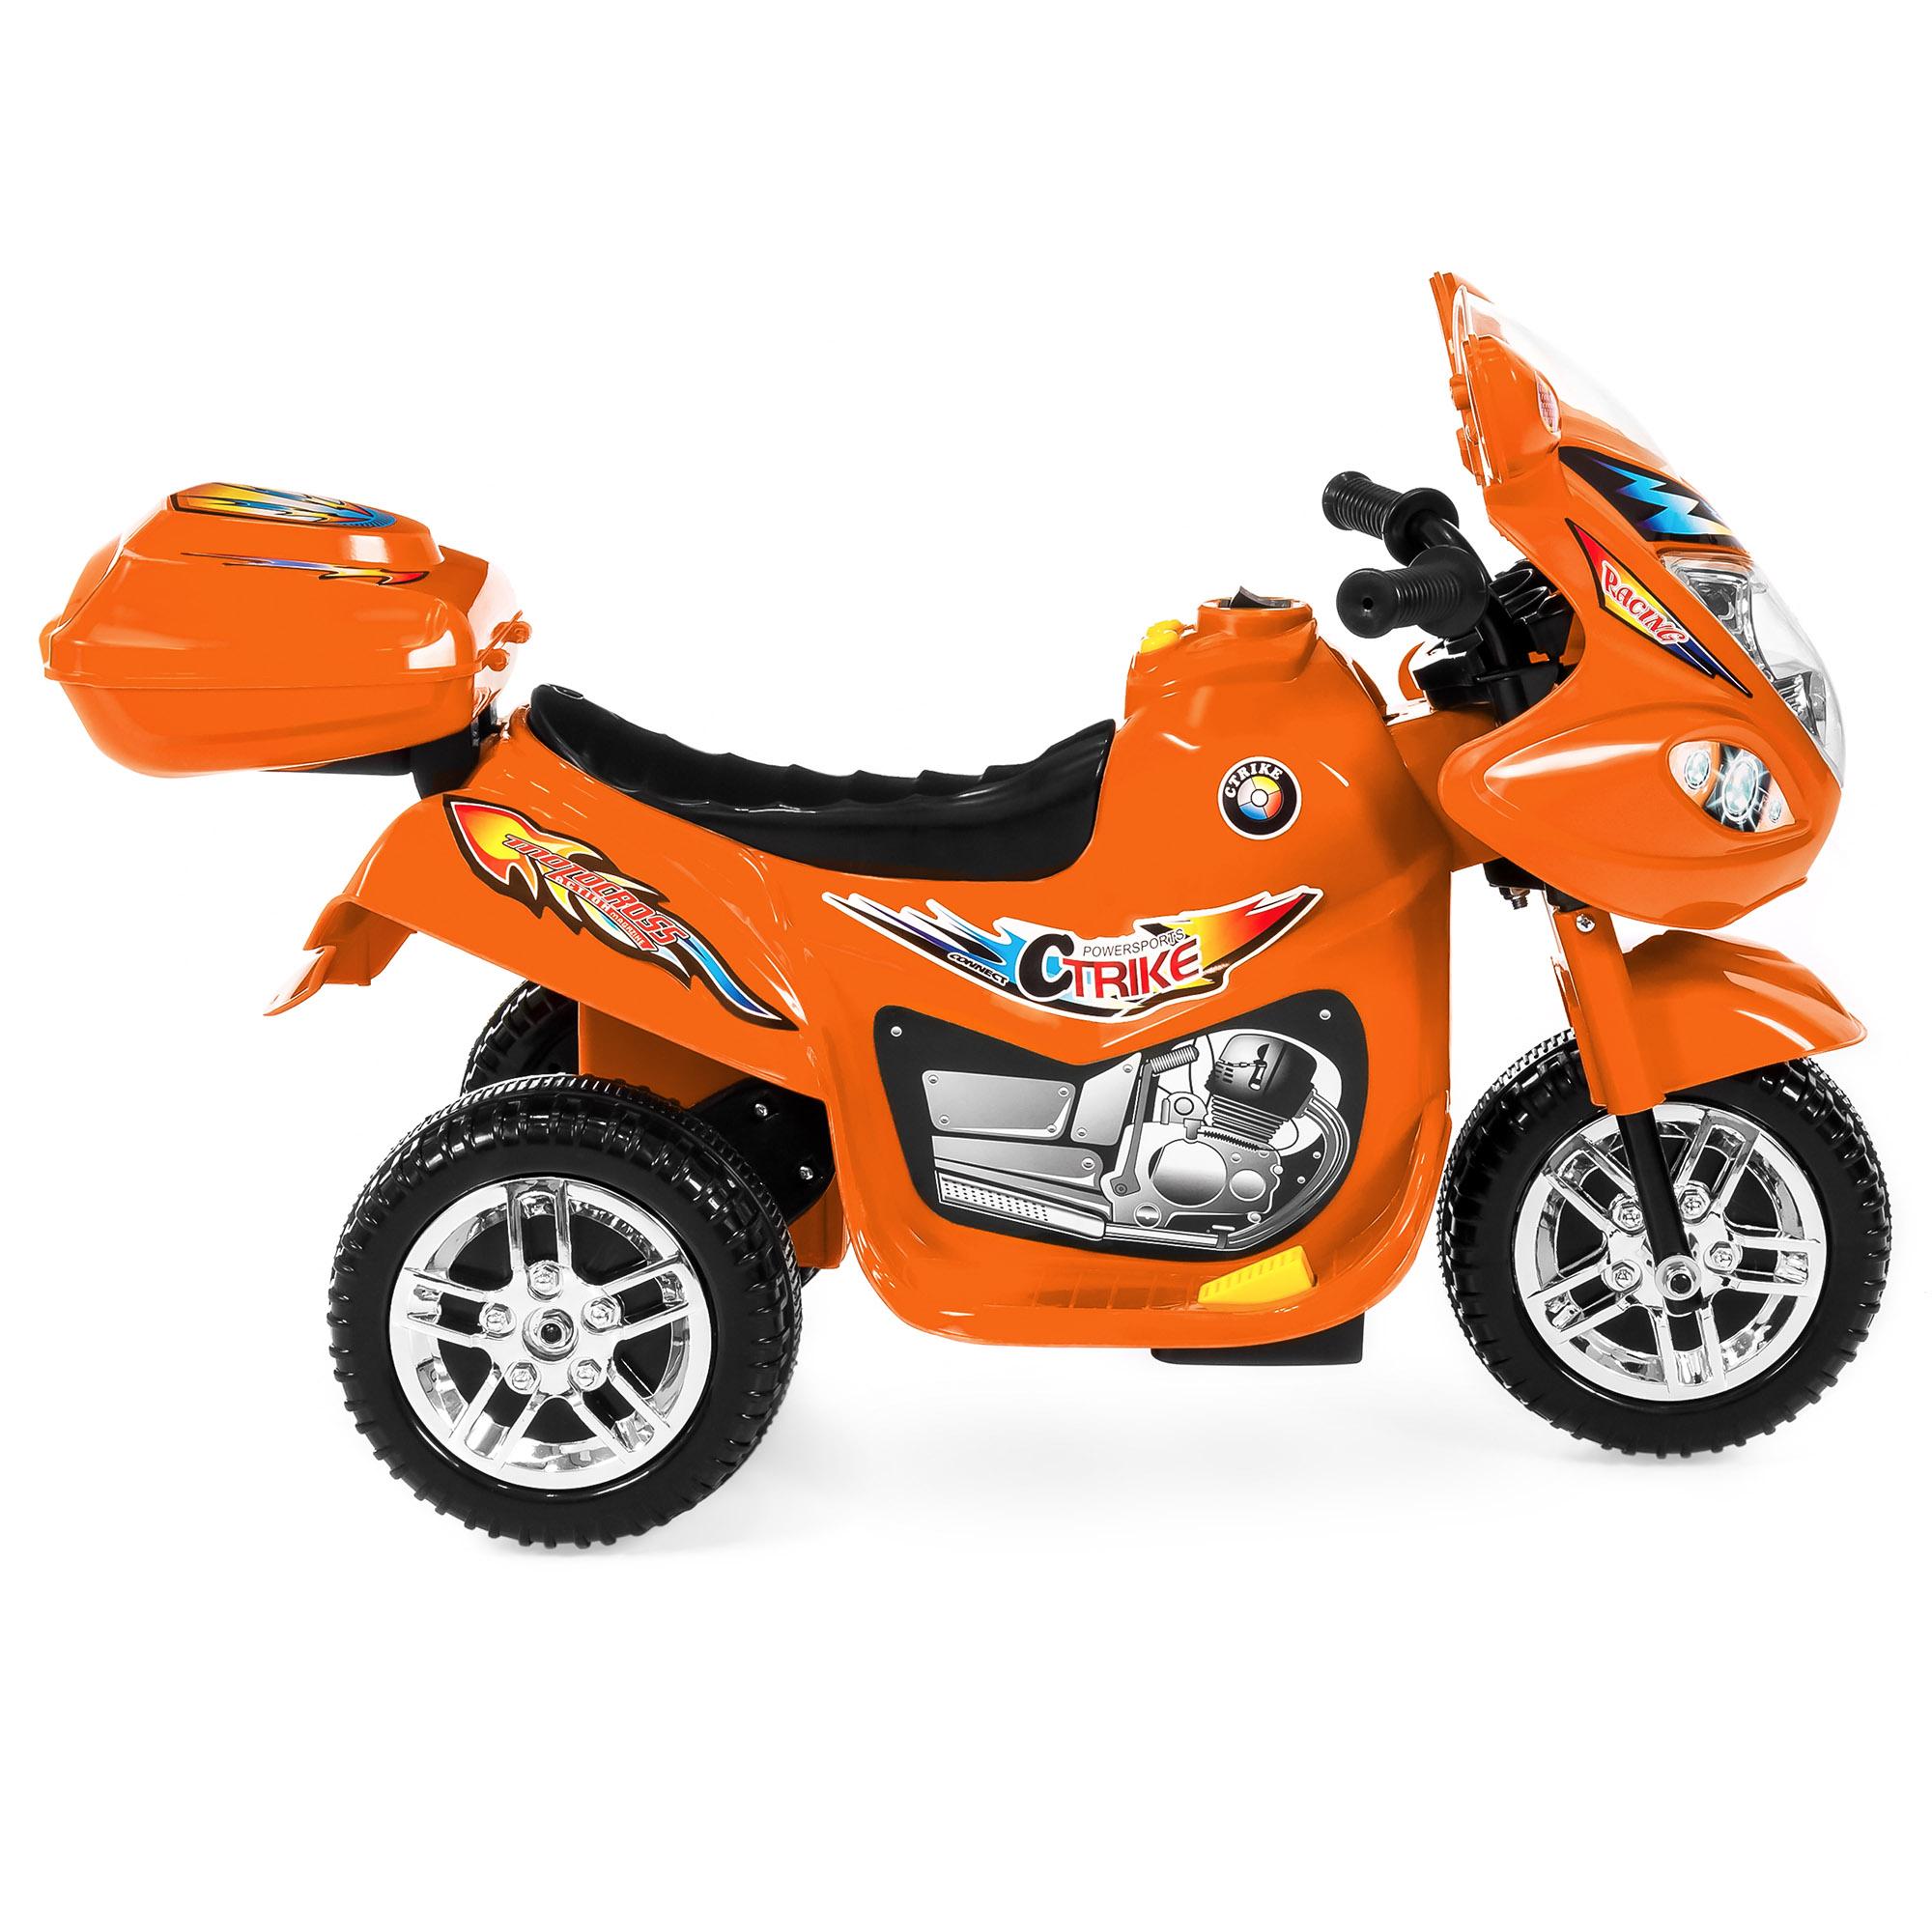 BCP-6V-Kids-3-Wheel-Motorcycle-Ride-On-Toy-w-LED-Lights-Music-Storage thumbnail 21